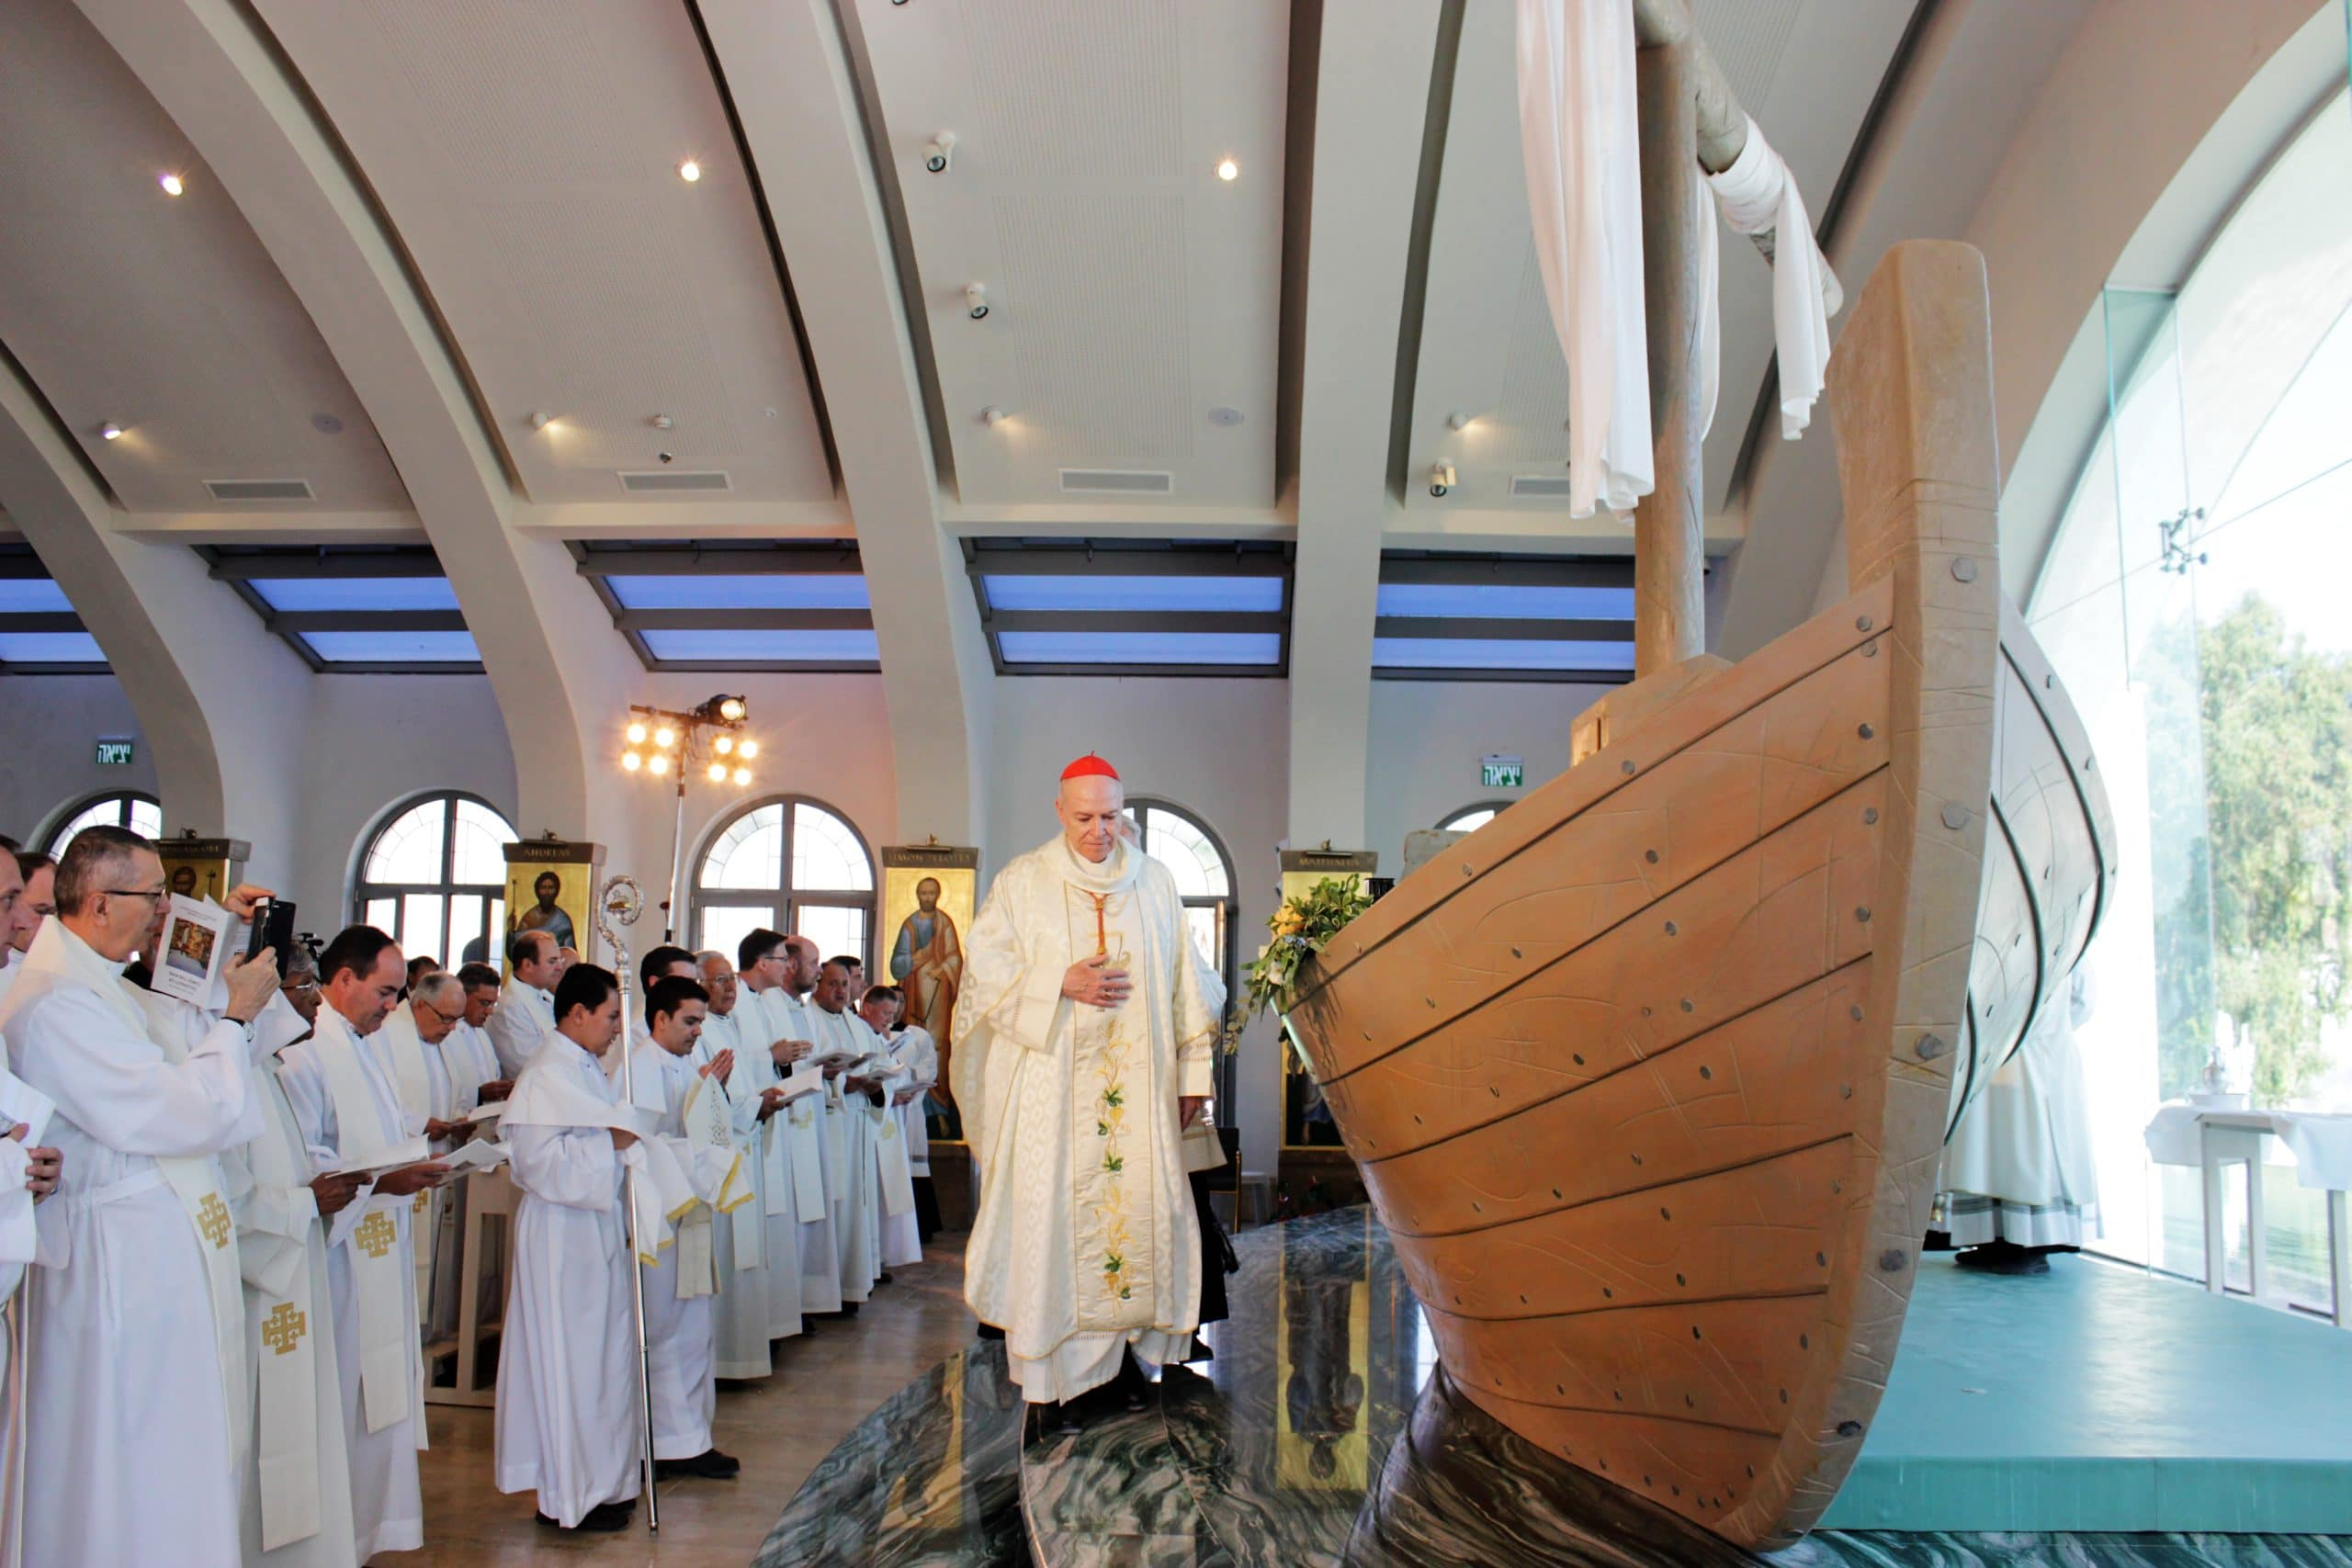 Cardenal Carlos Aguiar en la iglesia Duc In Altum